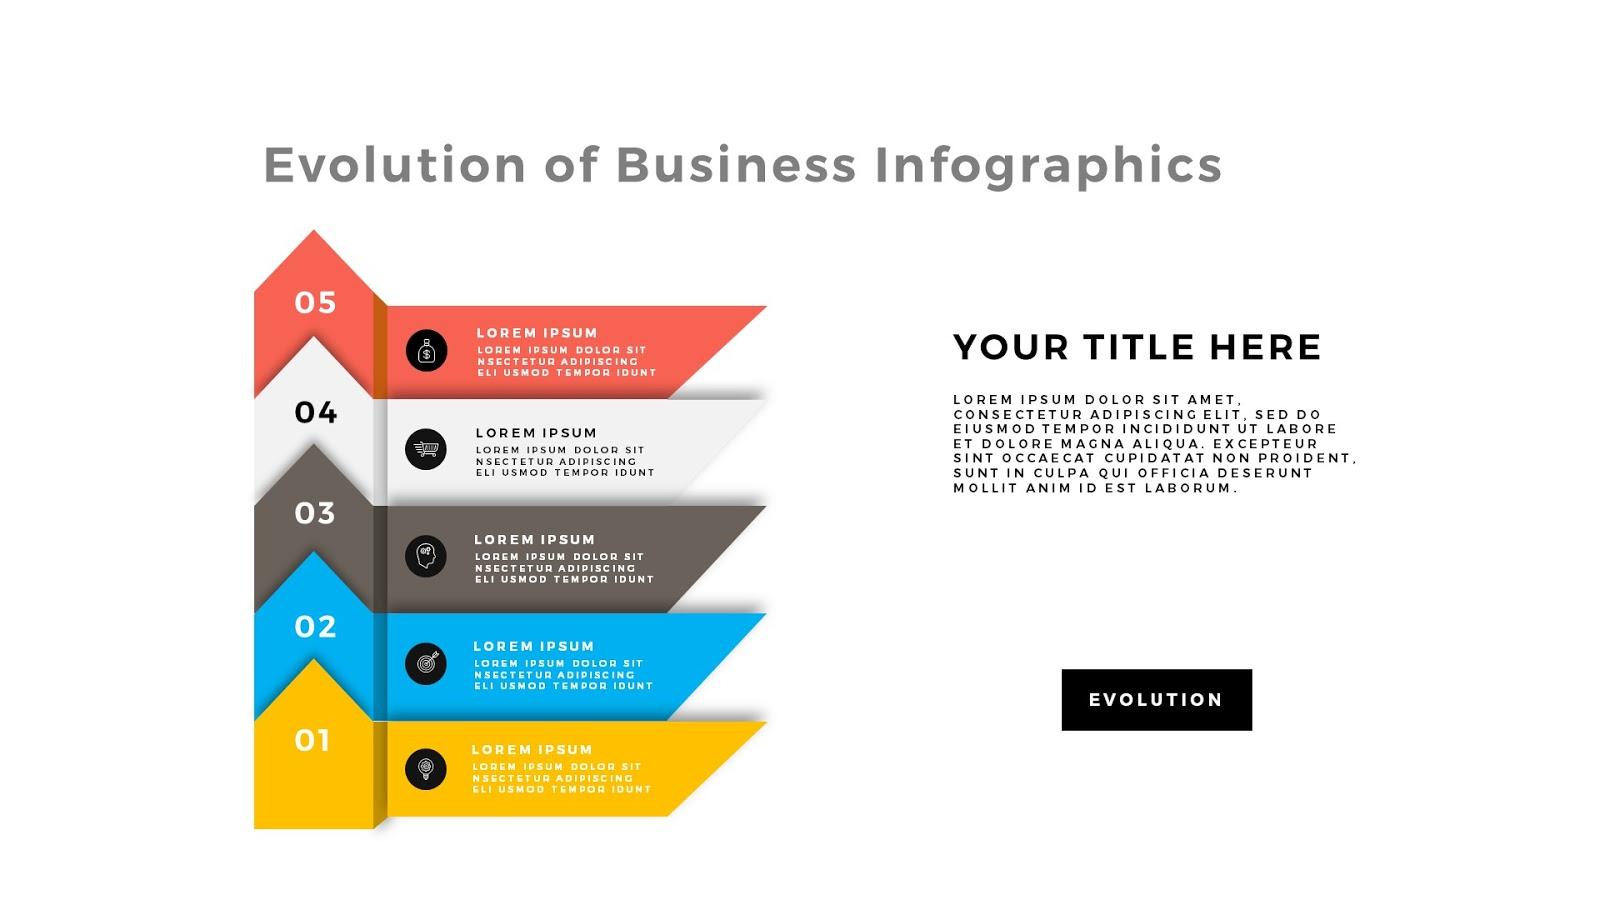 Evolution of business infographic powerpoint template evolution of business infographic free powerpoint template slide 4 toneelgroepblik Images